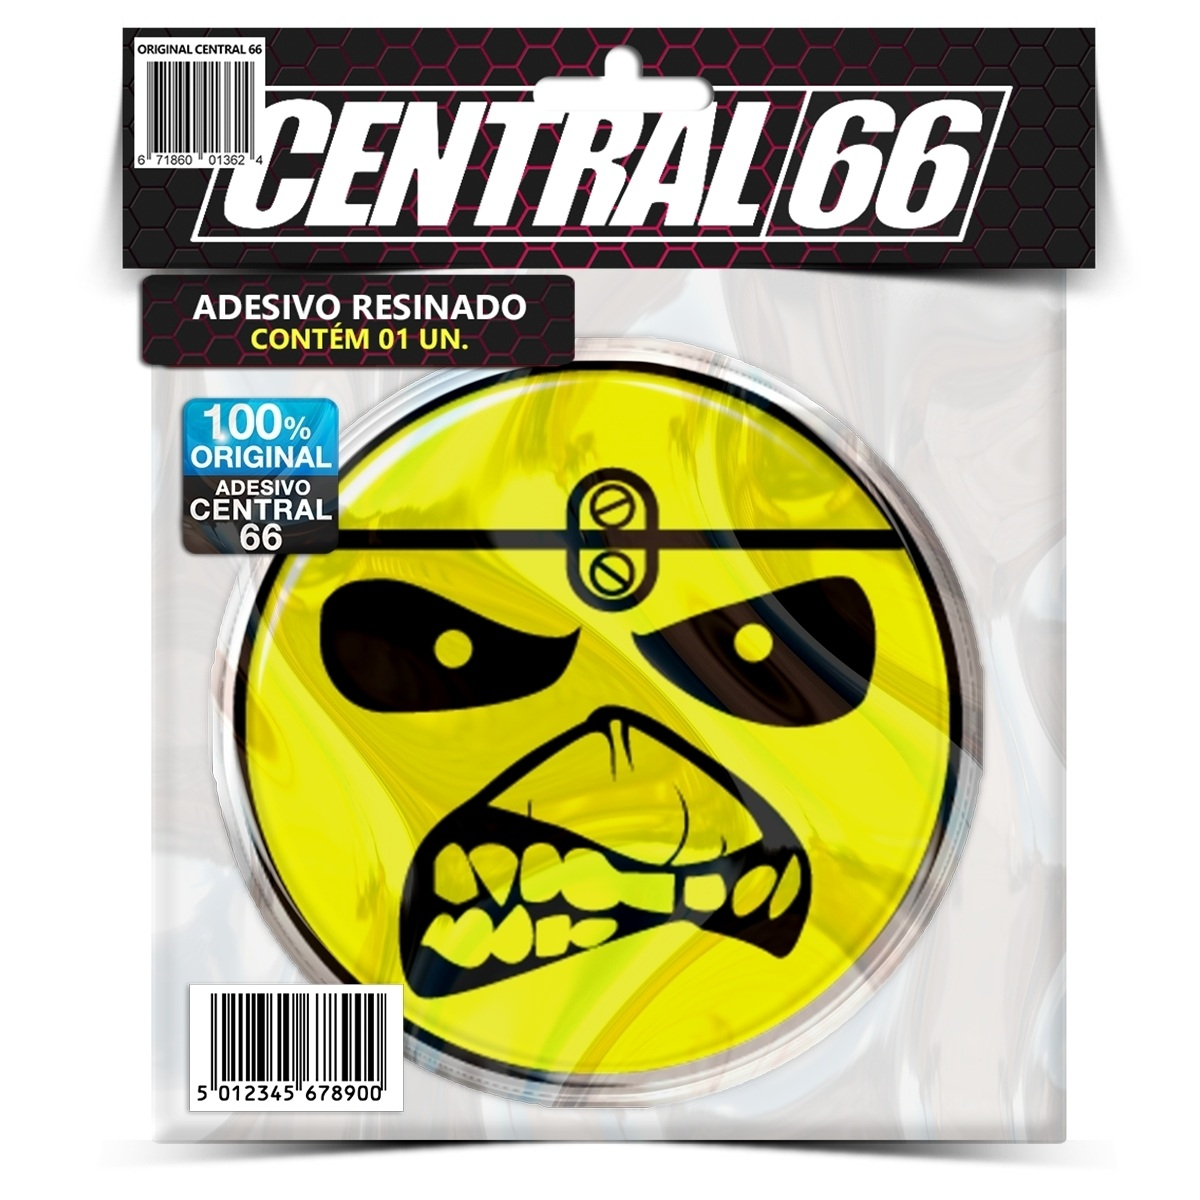 Adesivo Redondo Iron Maiden Eddie – Central 66